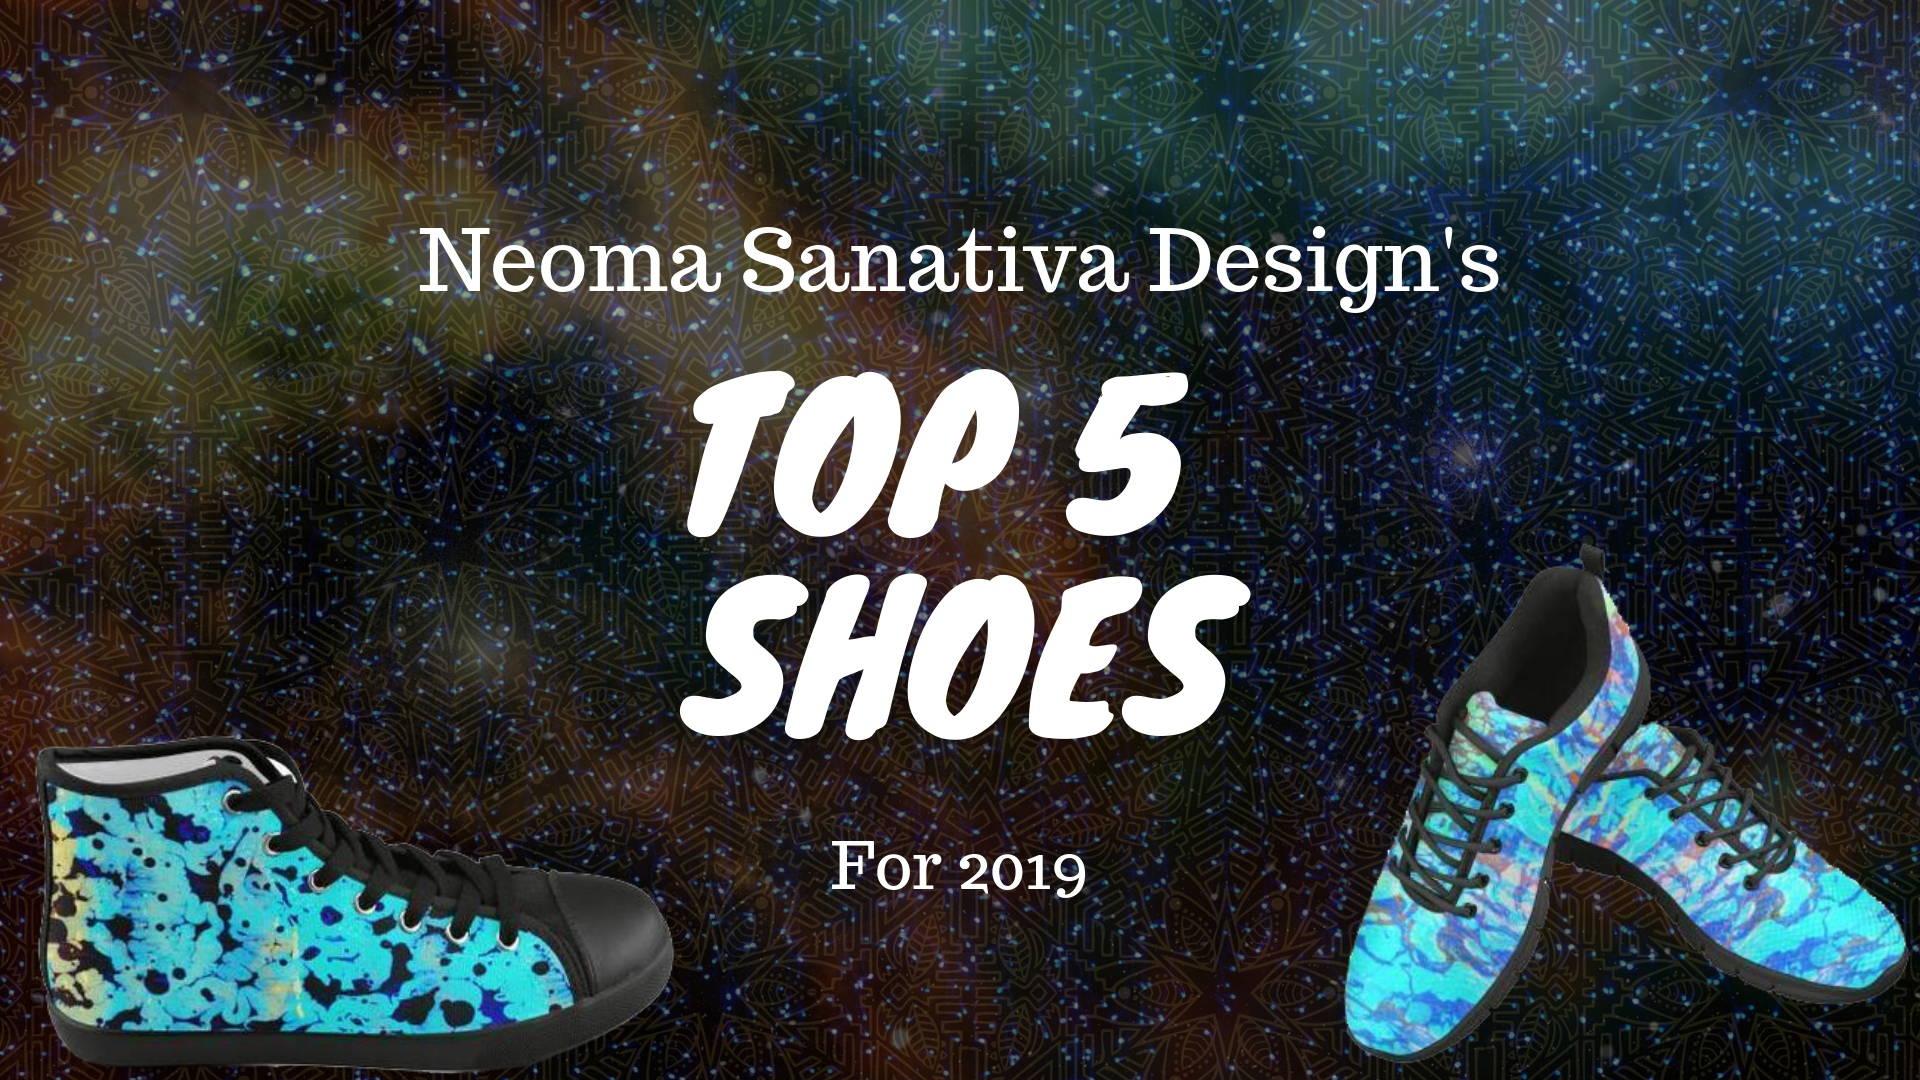 Top 5 Men's Shoes